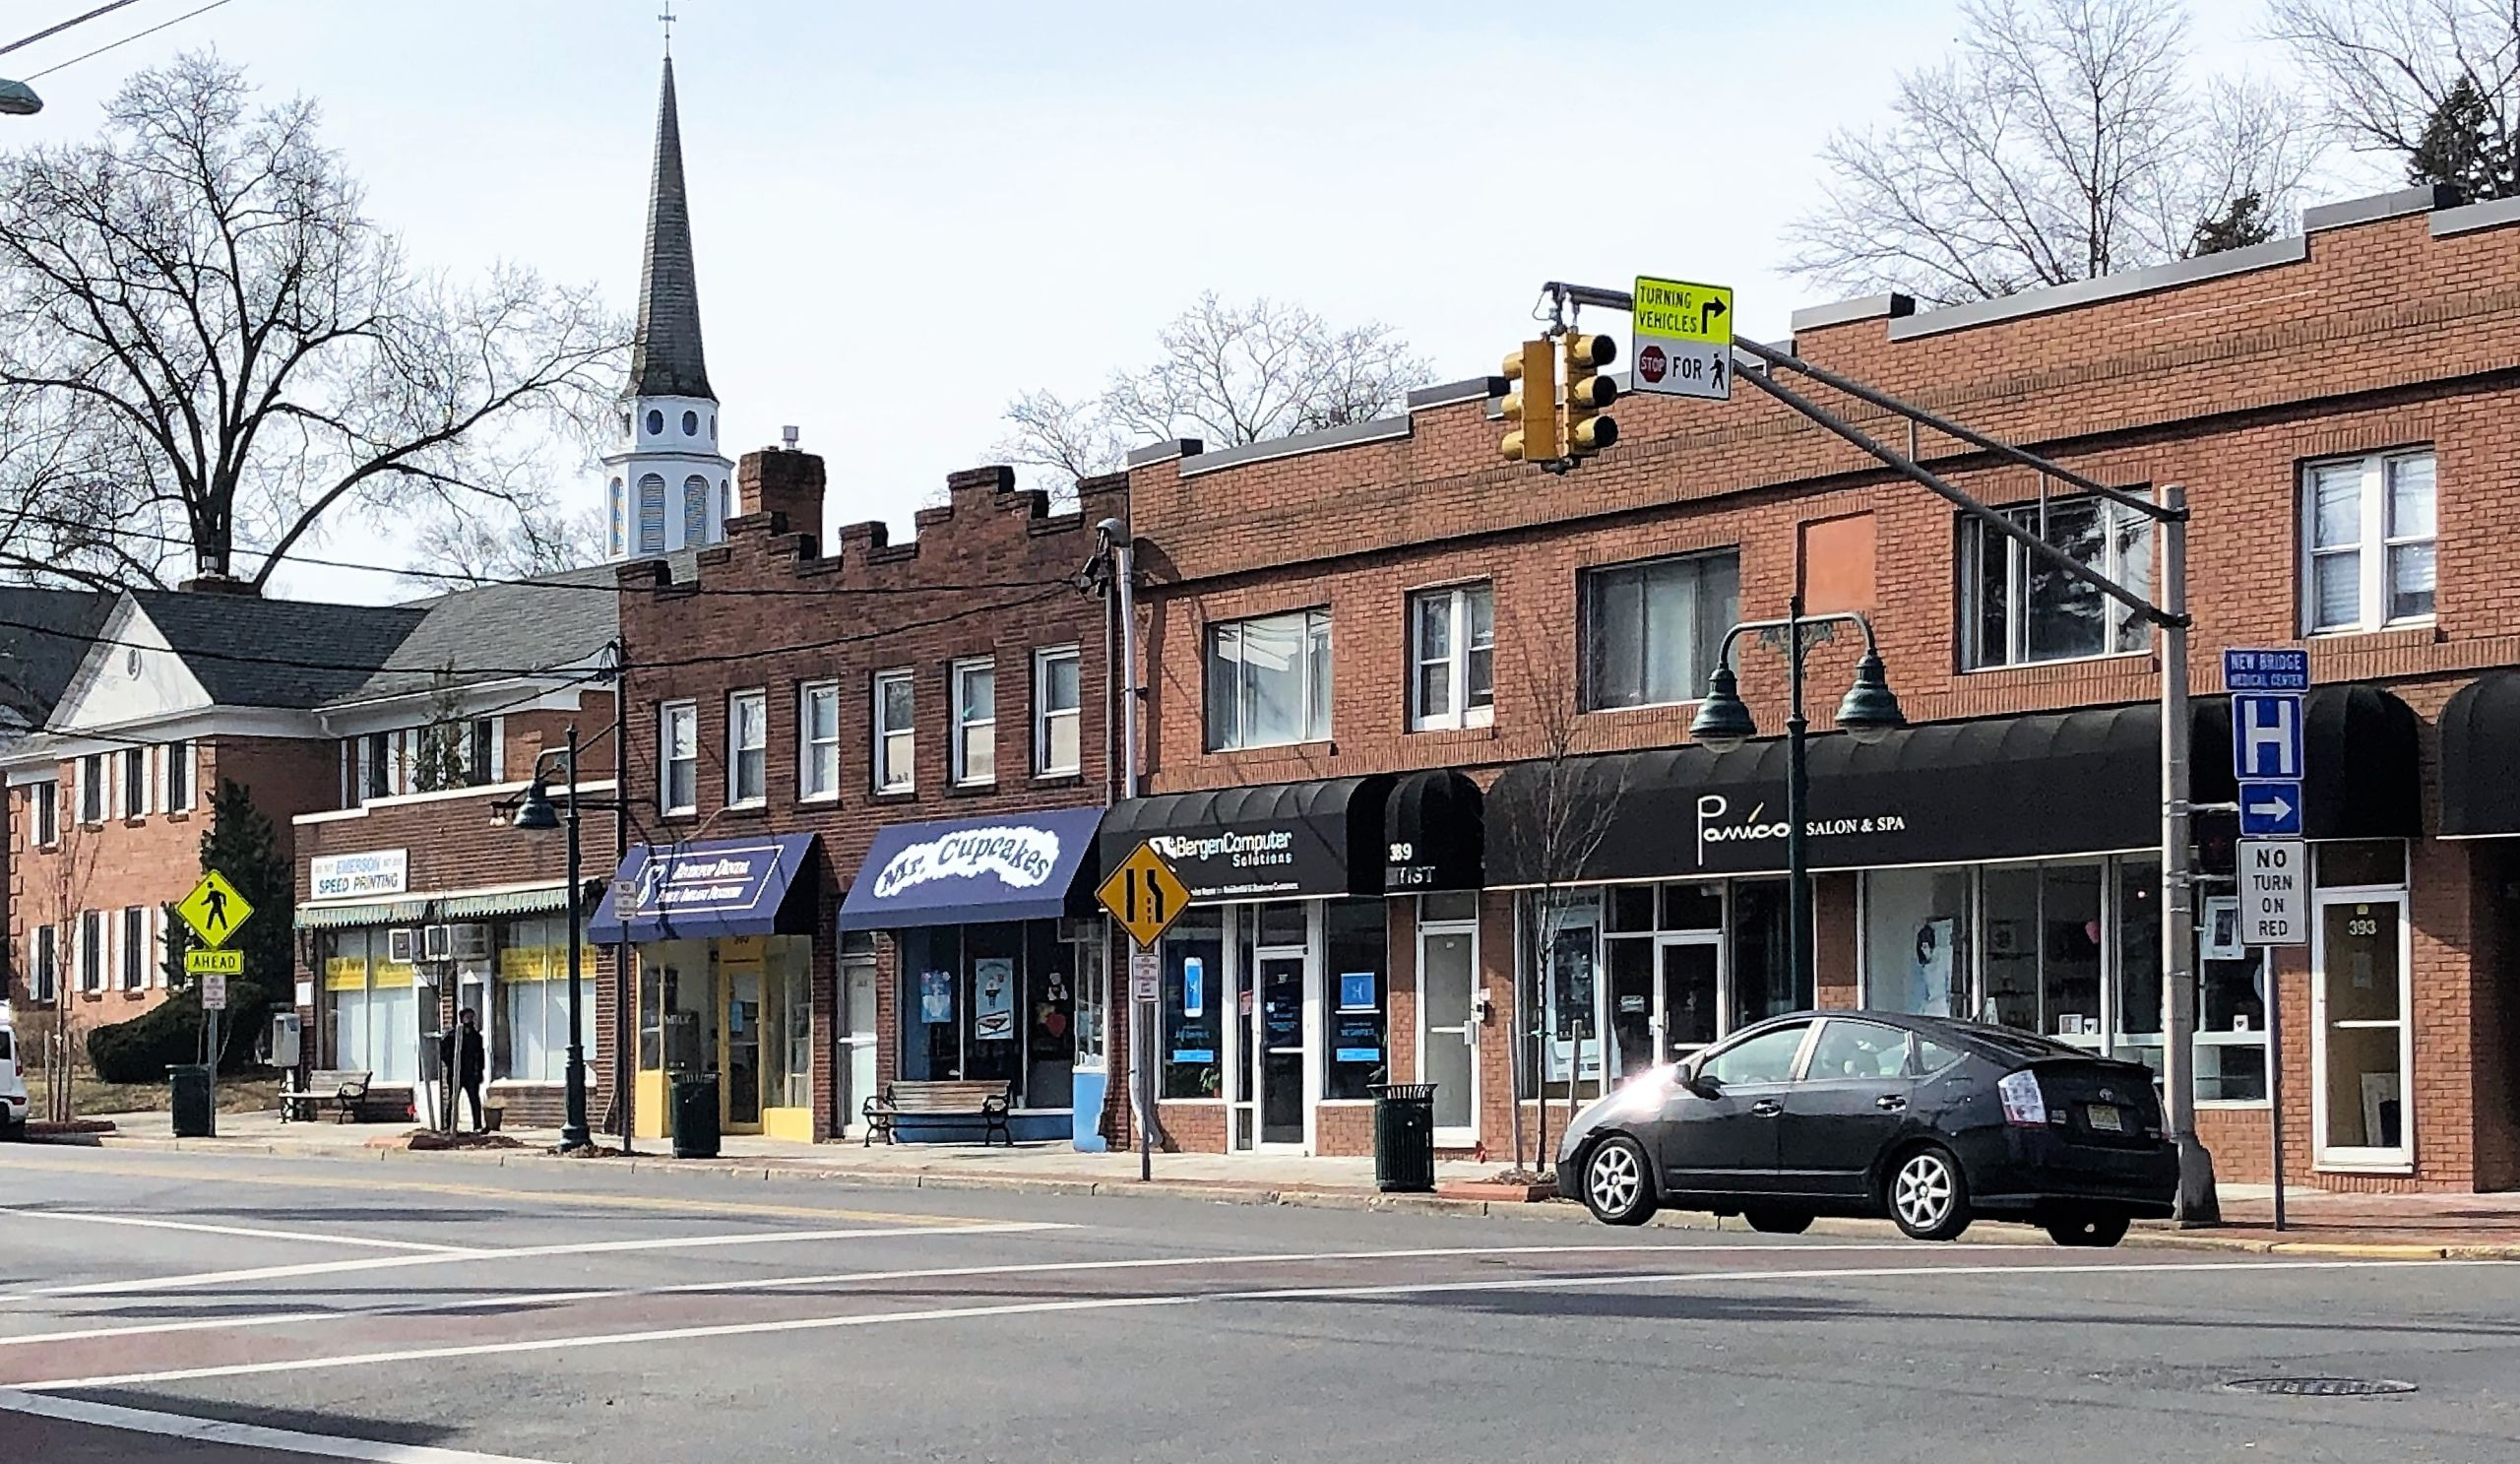 Oradell NJ